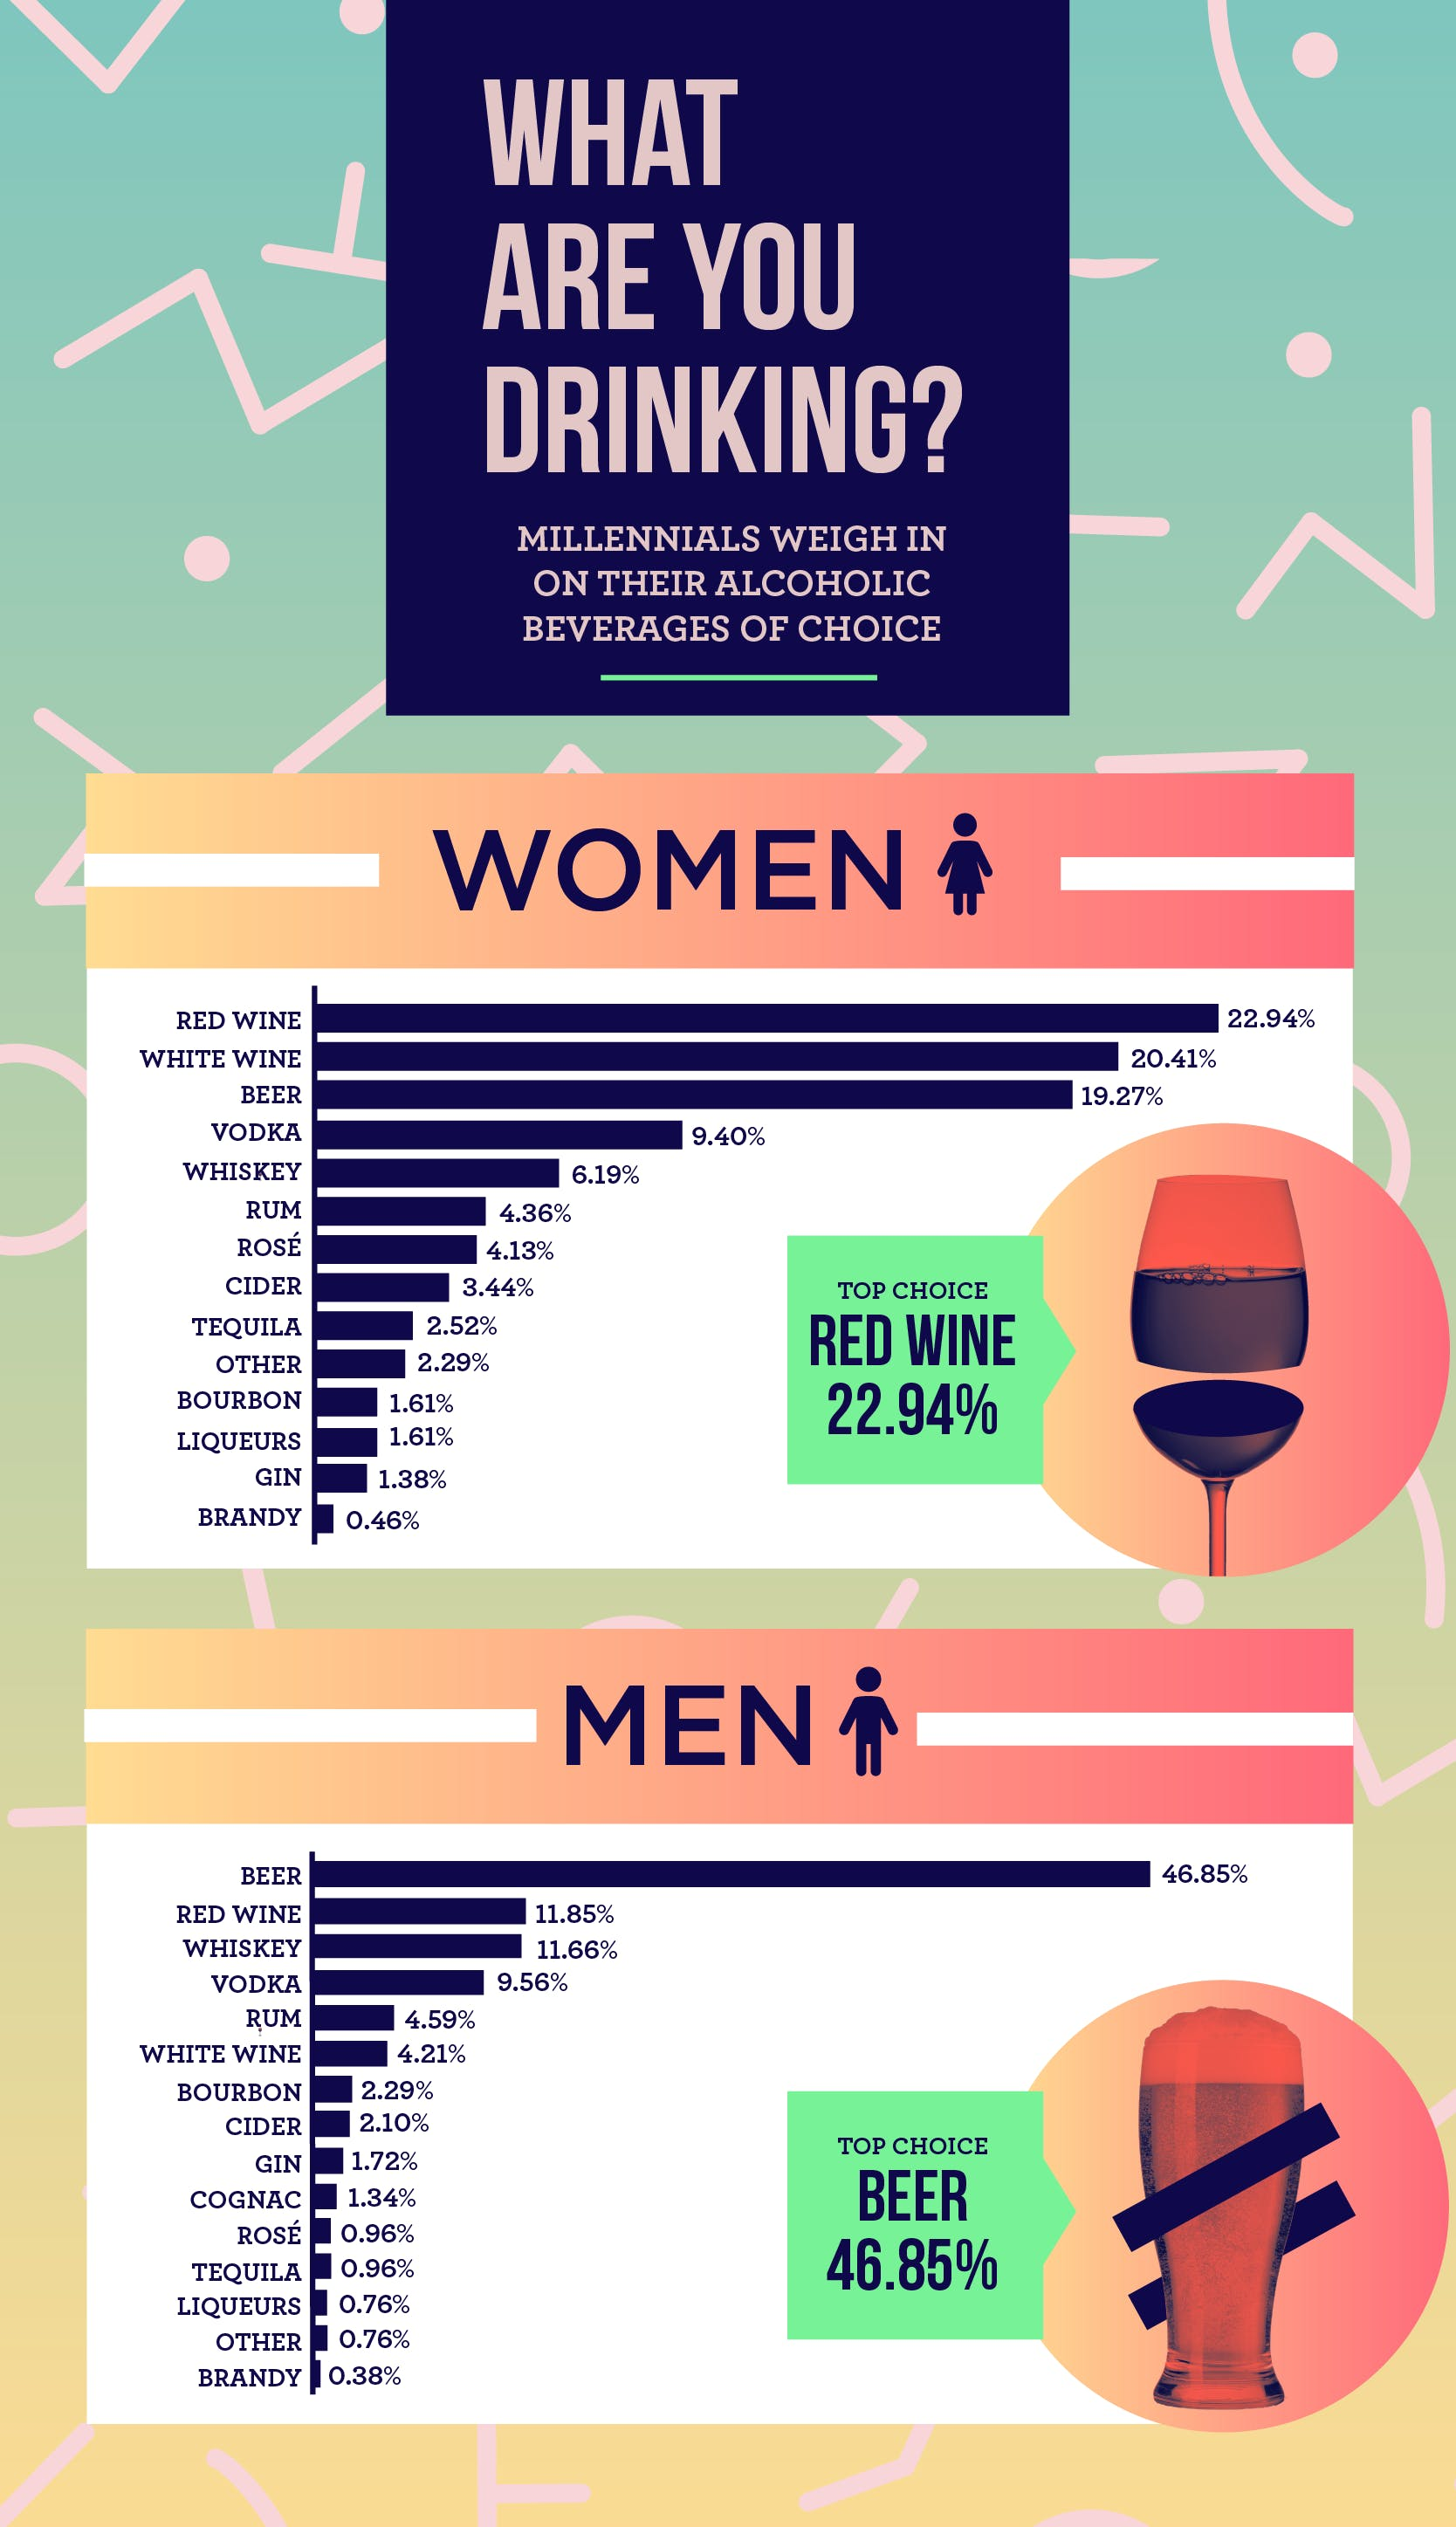 A new study suggests millennial men prefer beer whereas millennial women prefer wine.